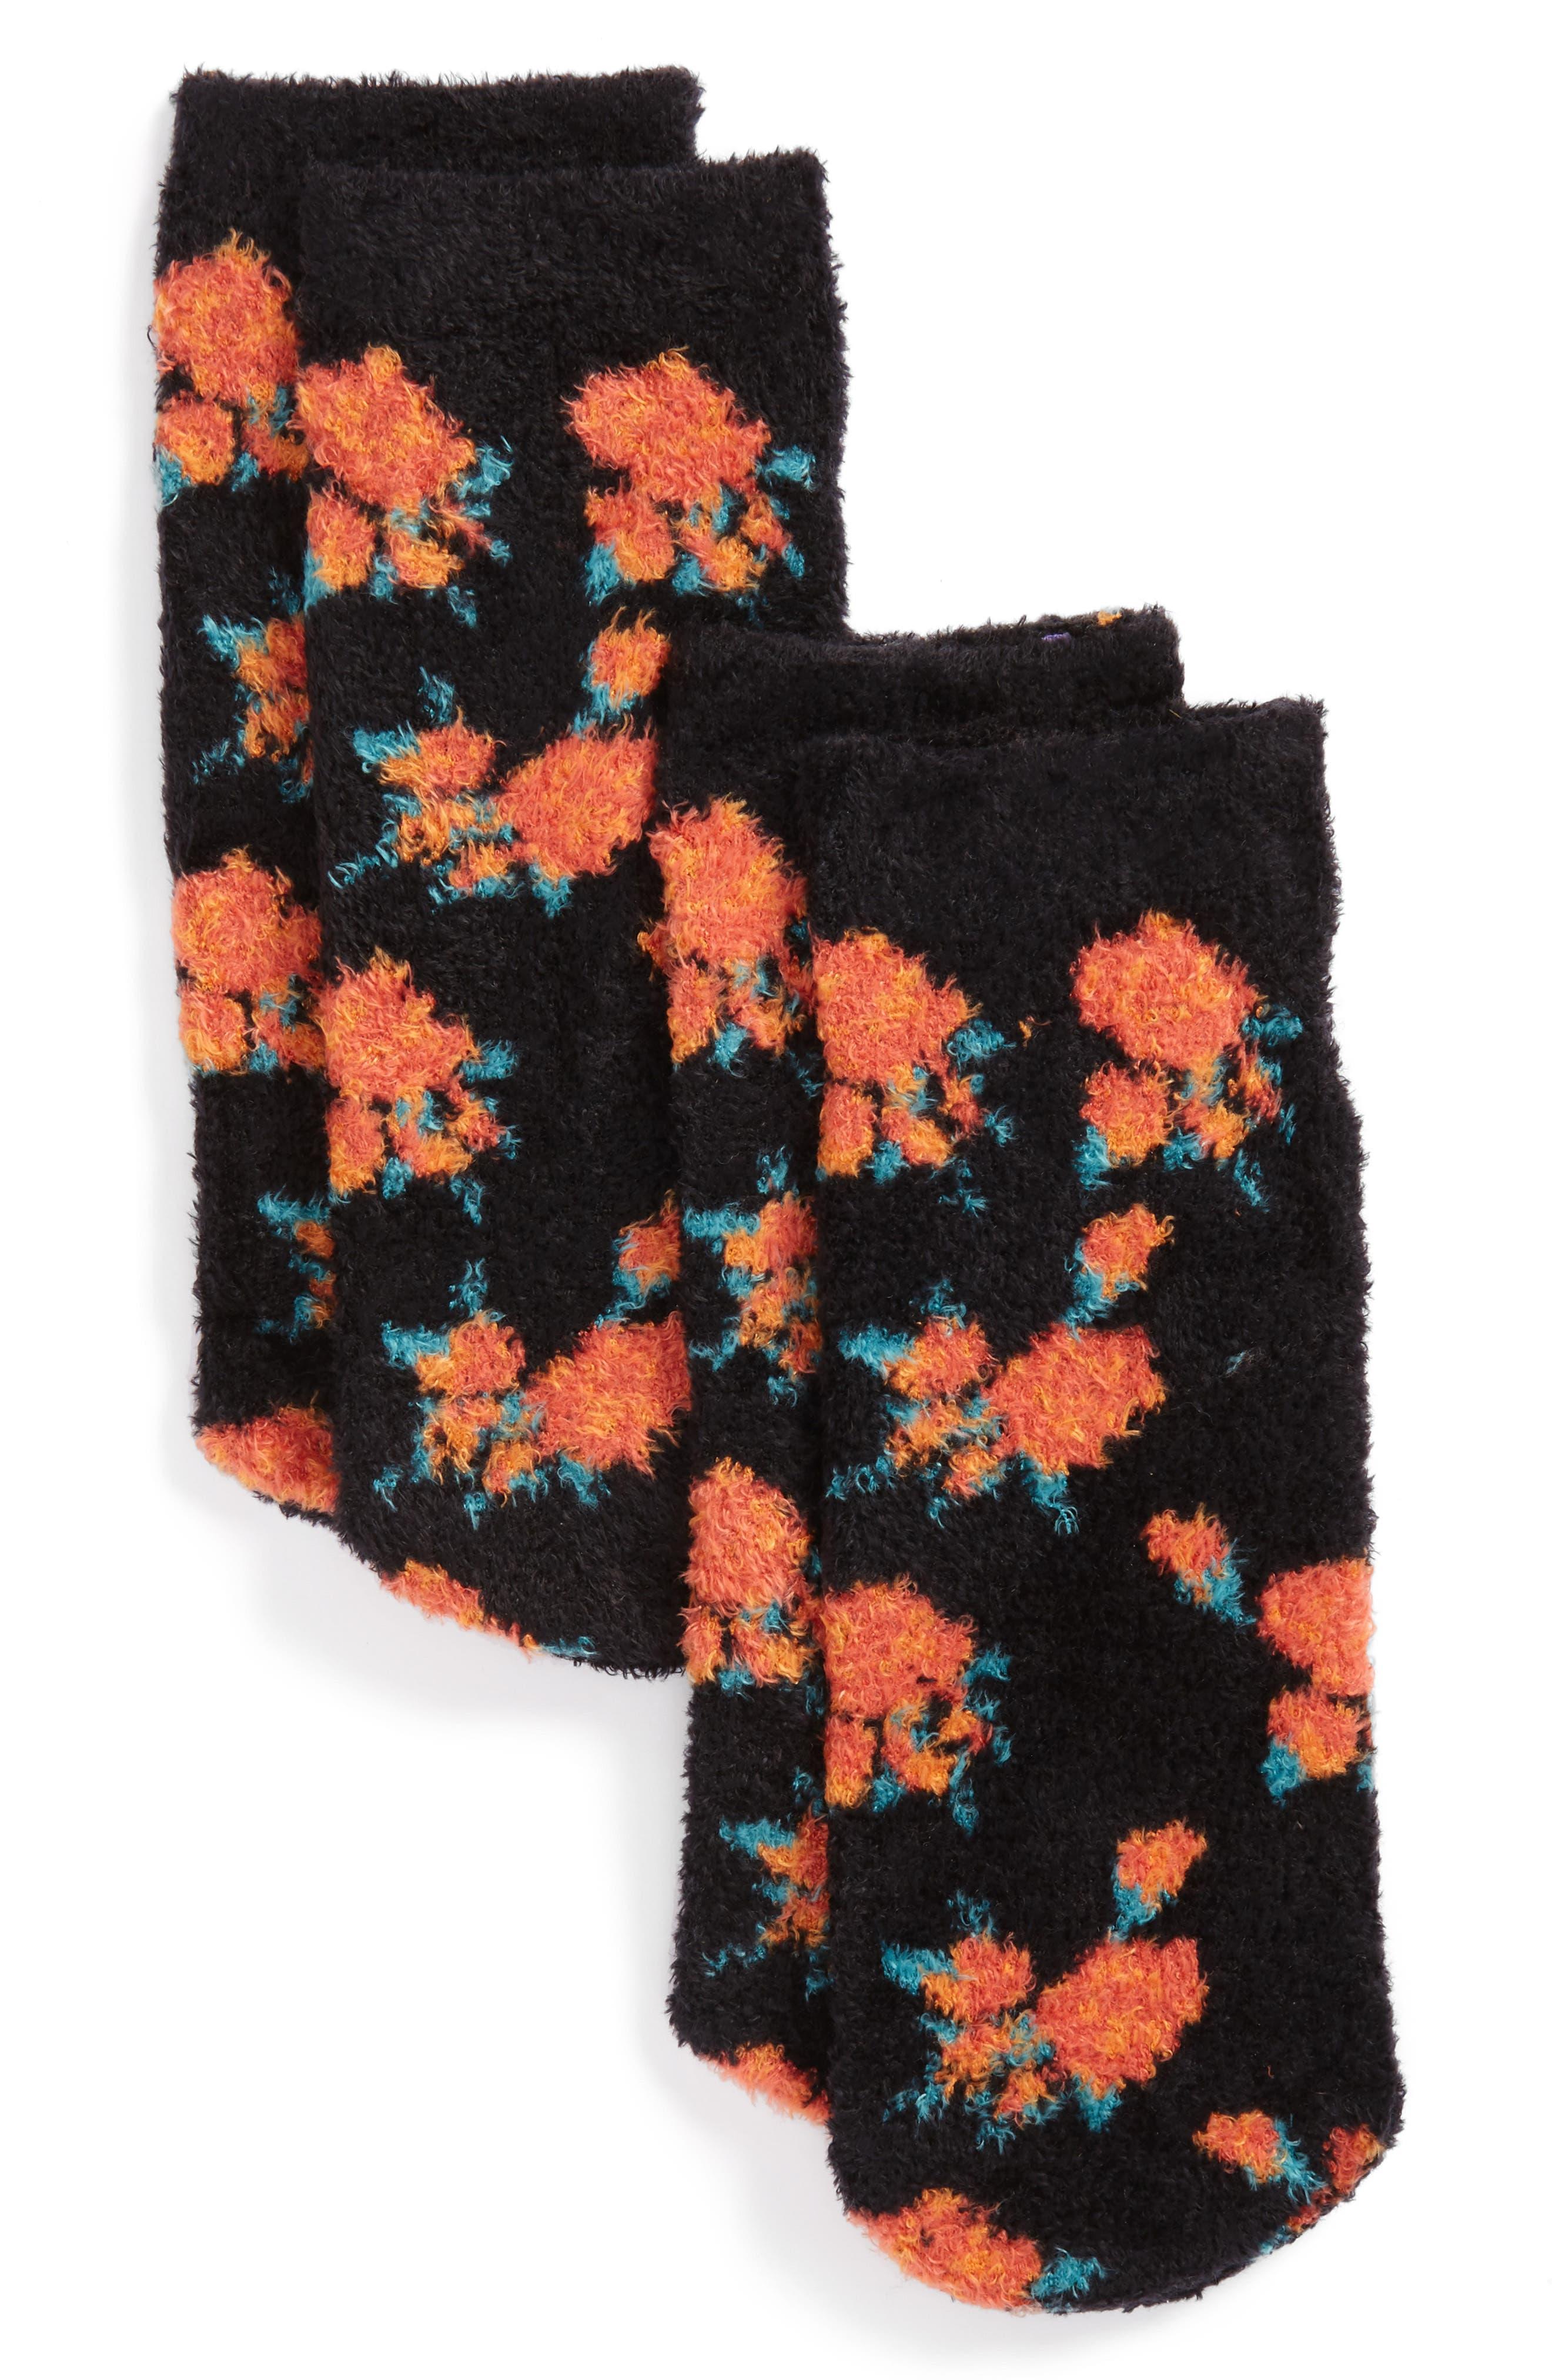 Set of 2 Butter Socks,                             Main thumbnail 1, color,                             001